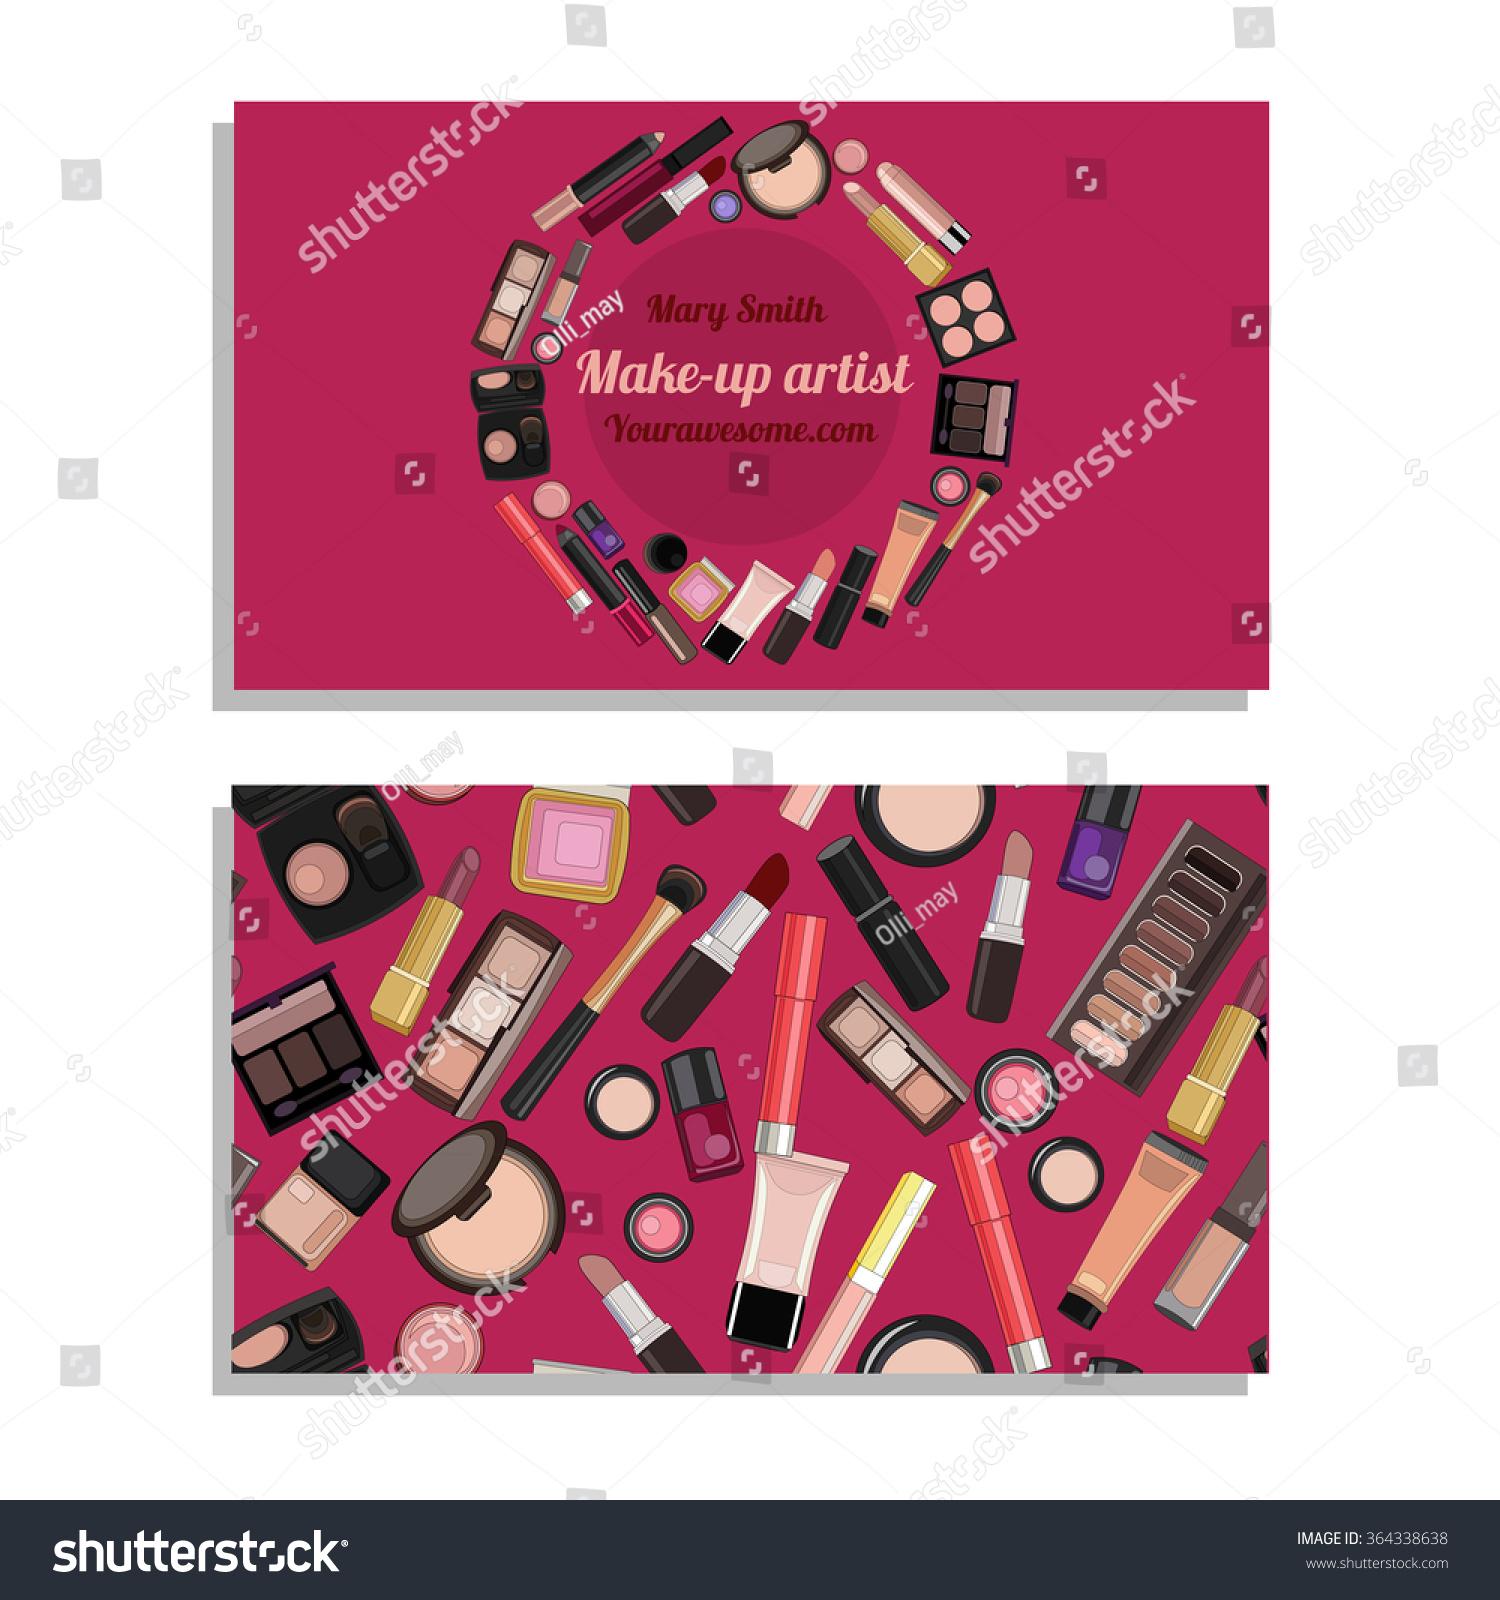 Makeup Artist Business Card Vector Template Stock Vector HD (Royalty ...